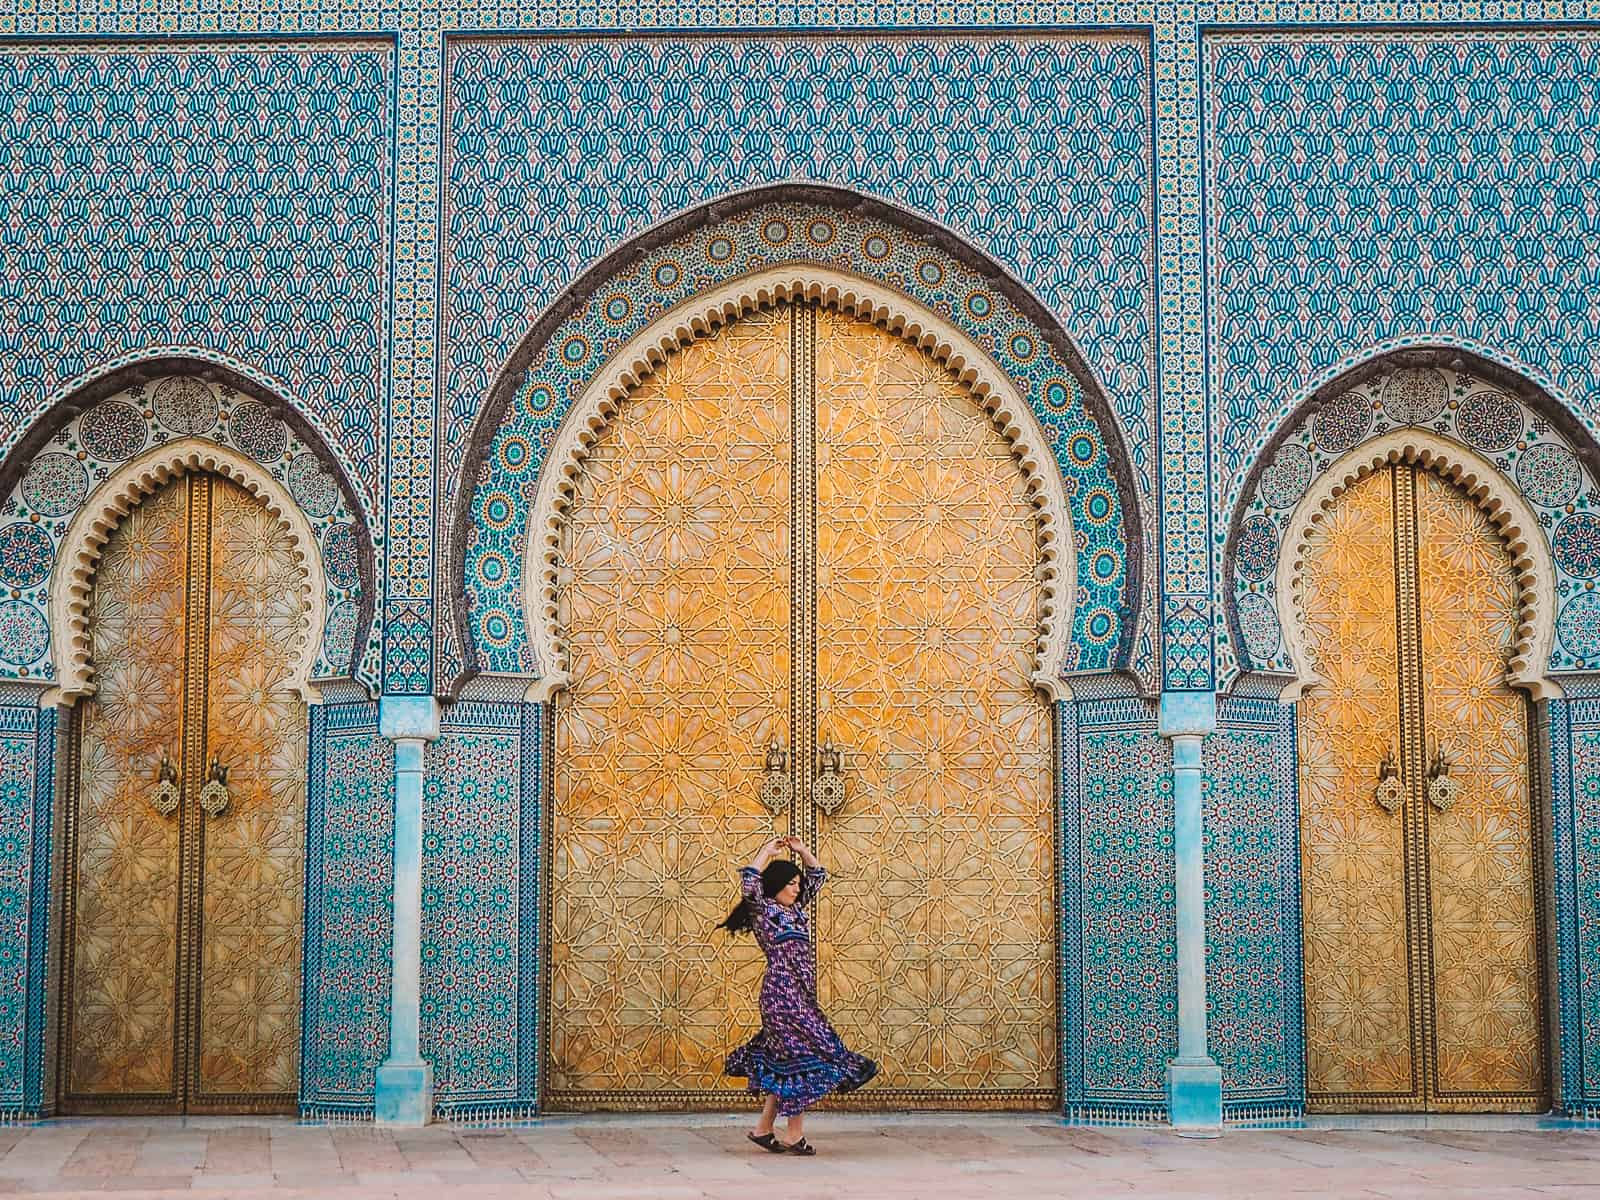 Fez Royal Palace Doors | Fes Palais Royal